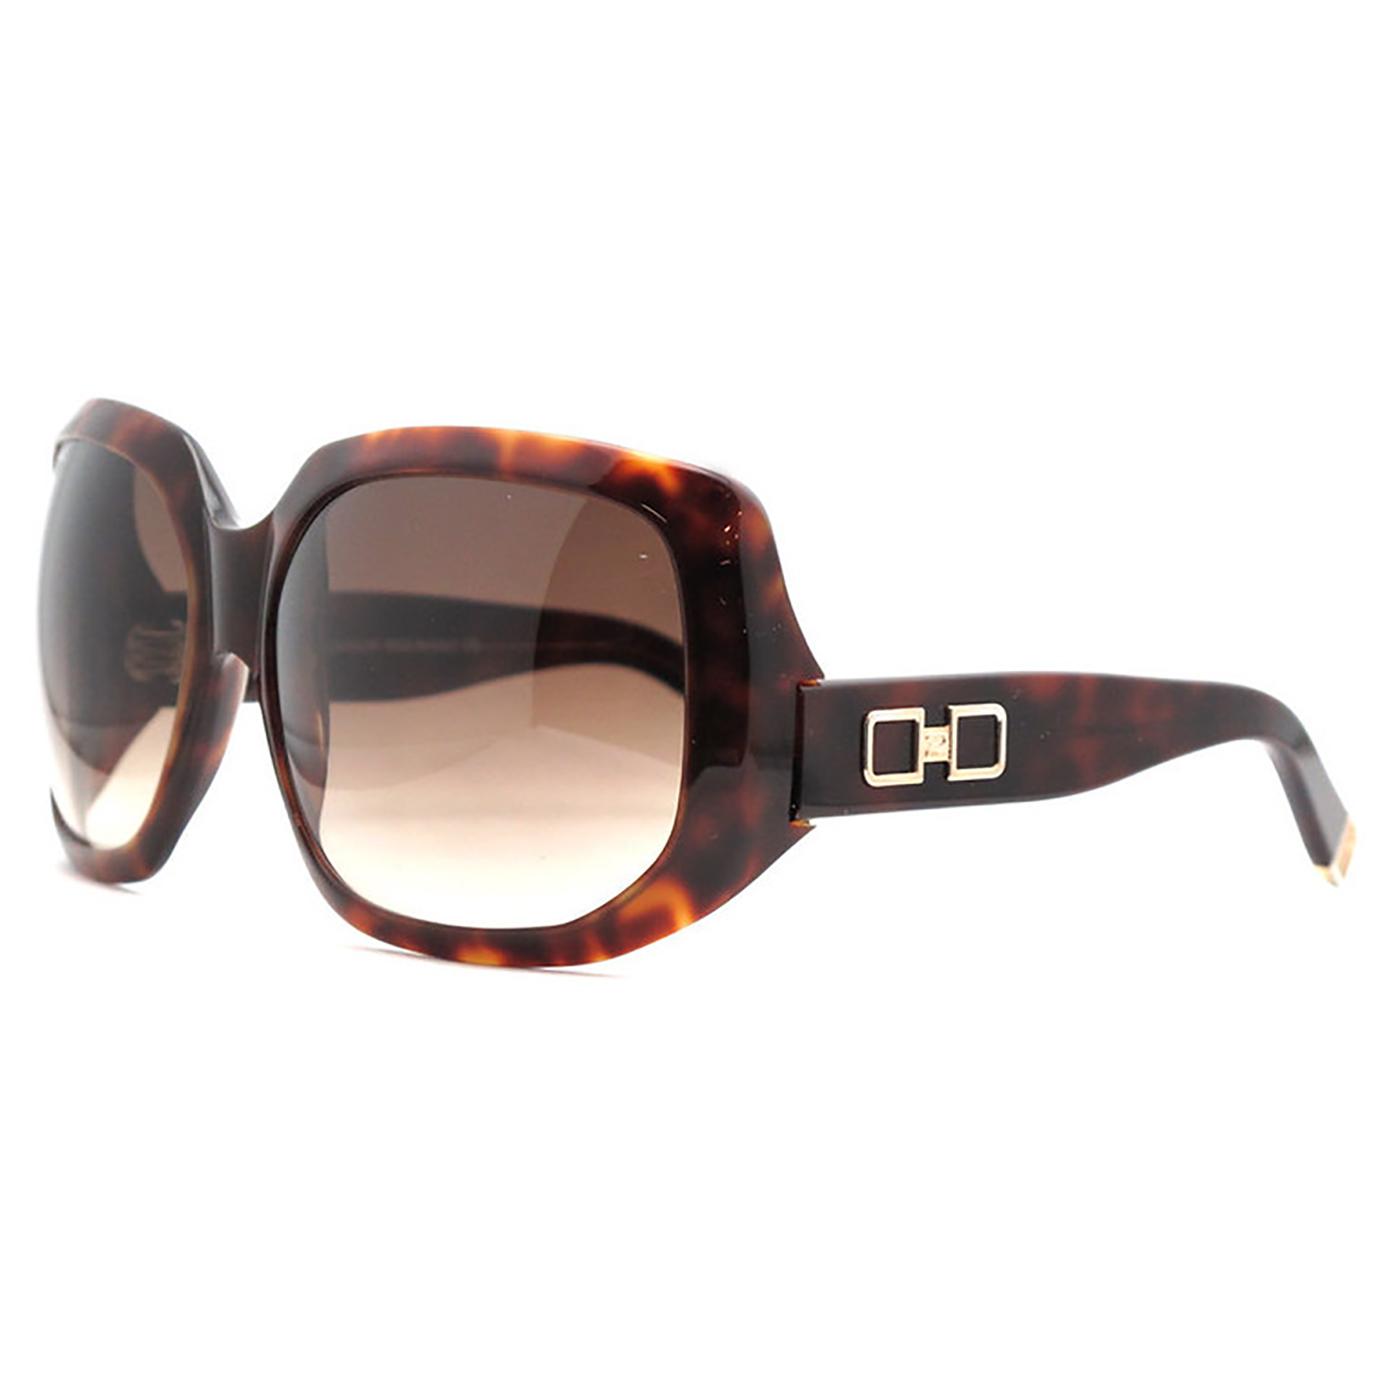 DSquared DQ 0020/S 52F Dark Havana Oversized Full Rim Sunglasses